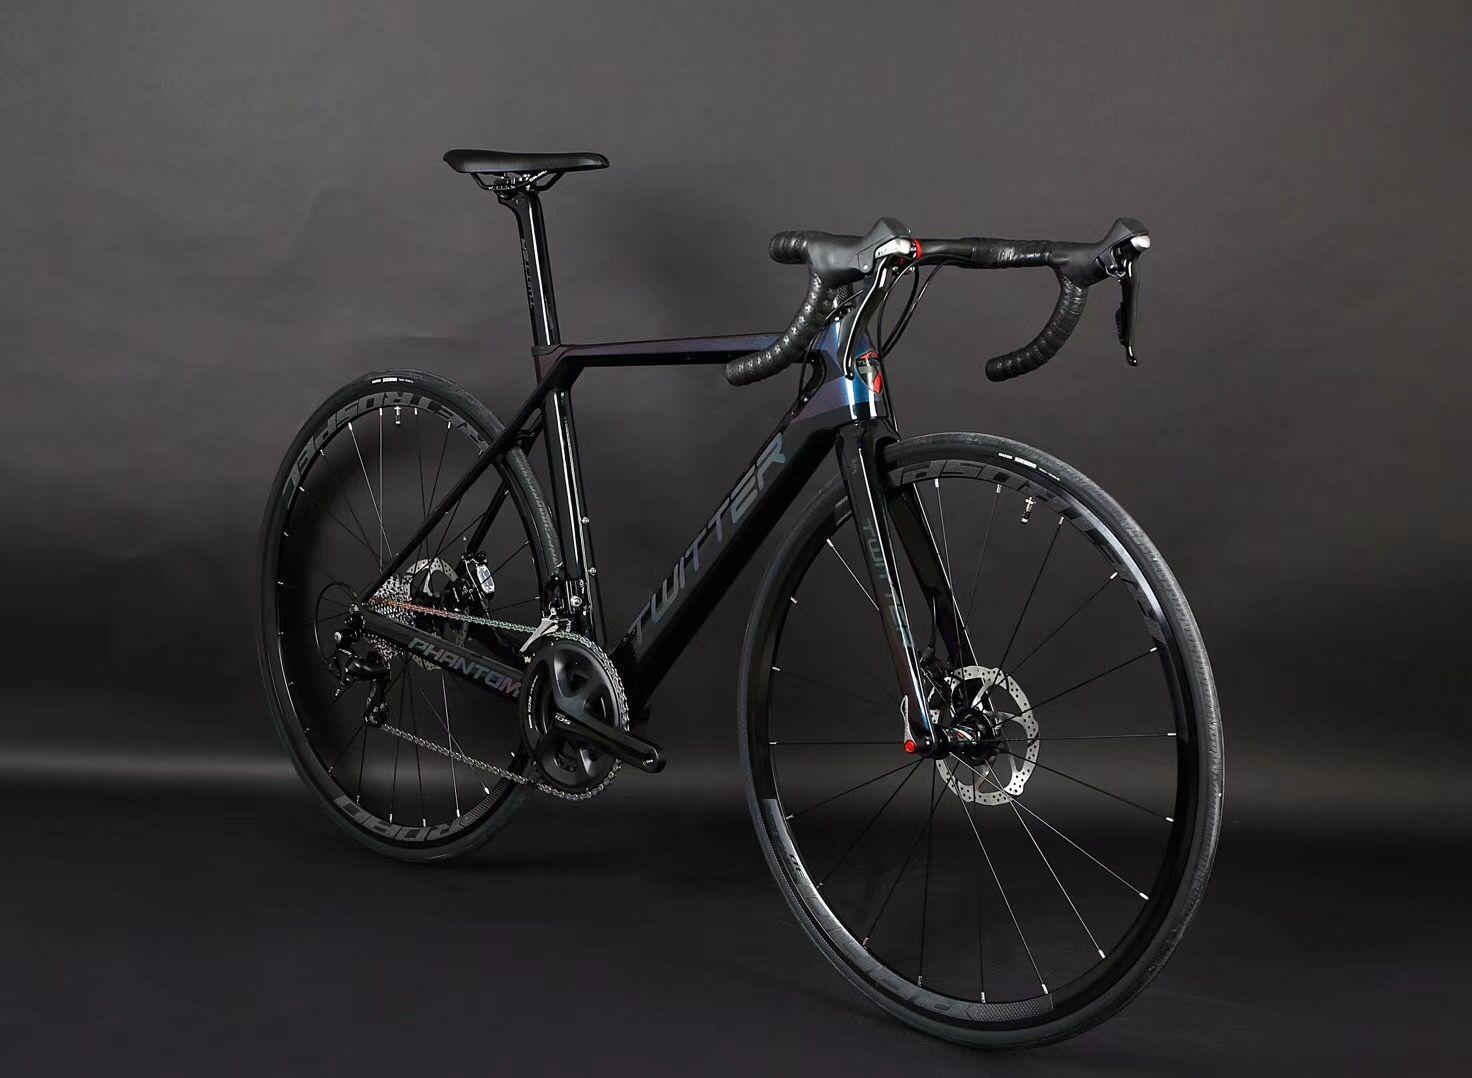 bcb5d3beeea TWITTER carbon road bike of PHANTOM-OFF Road, with SHIMANO SORA/R3000-